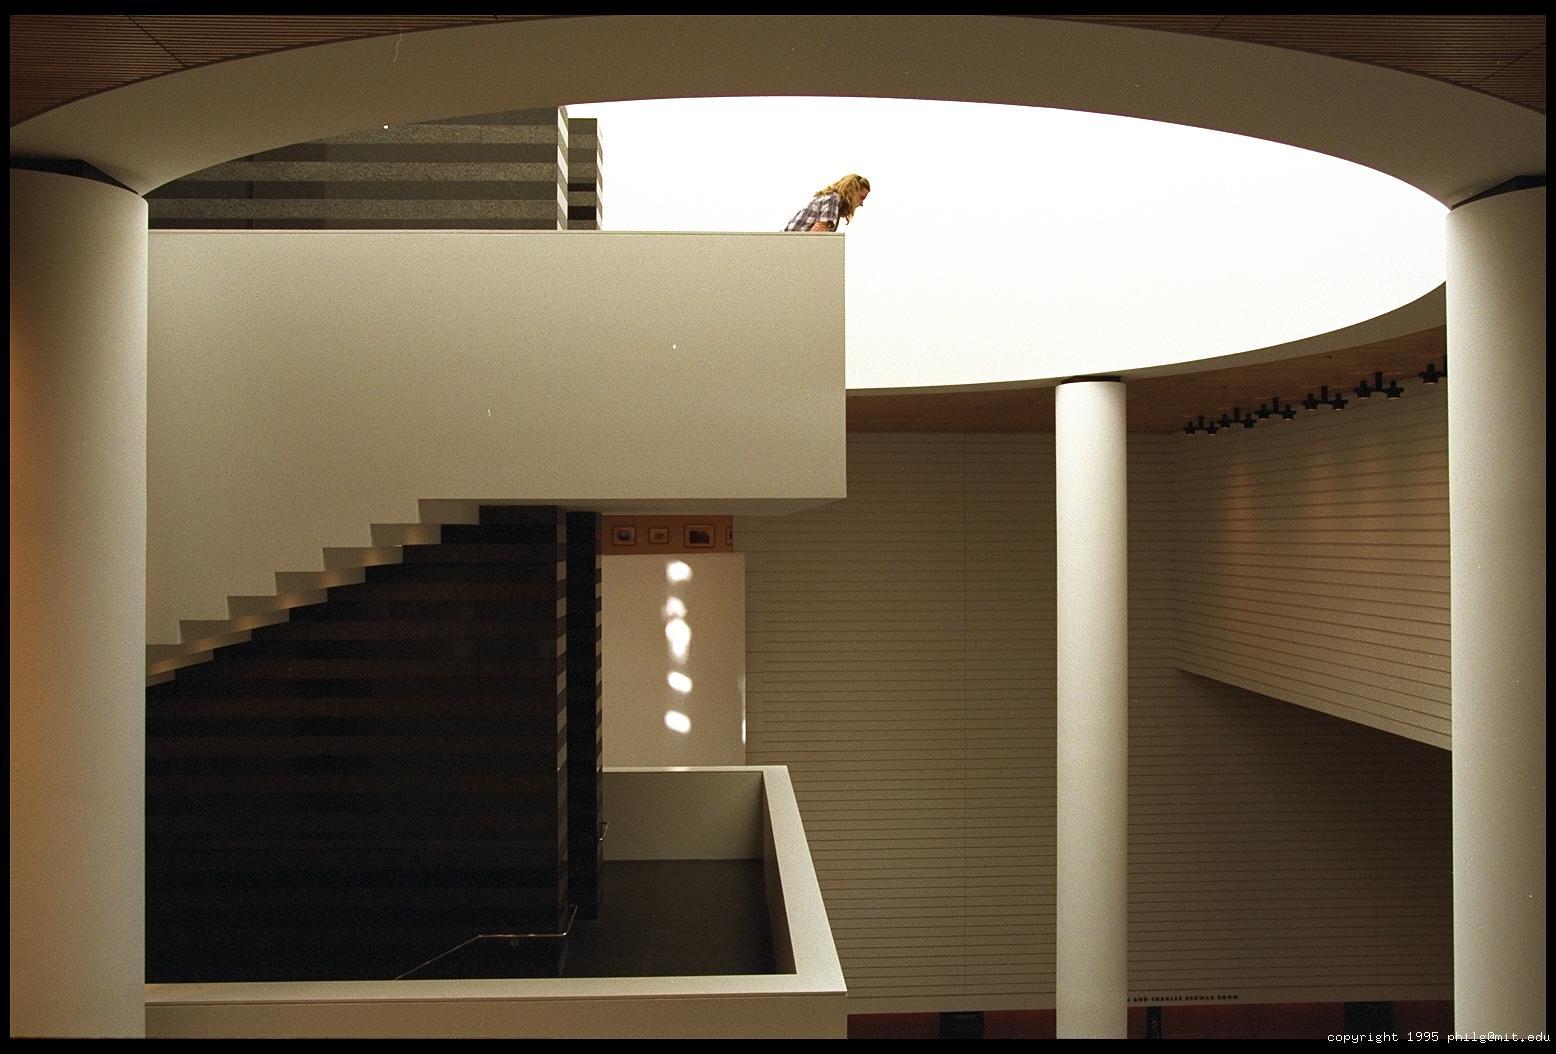 Sf moma 5 for San francisco museum modern art